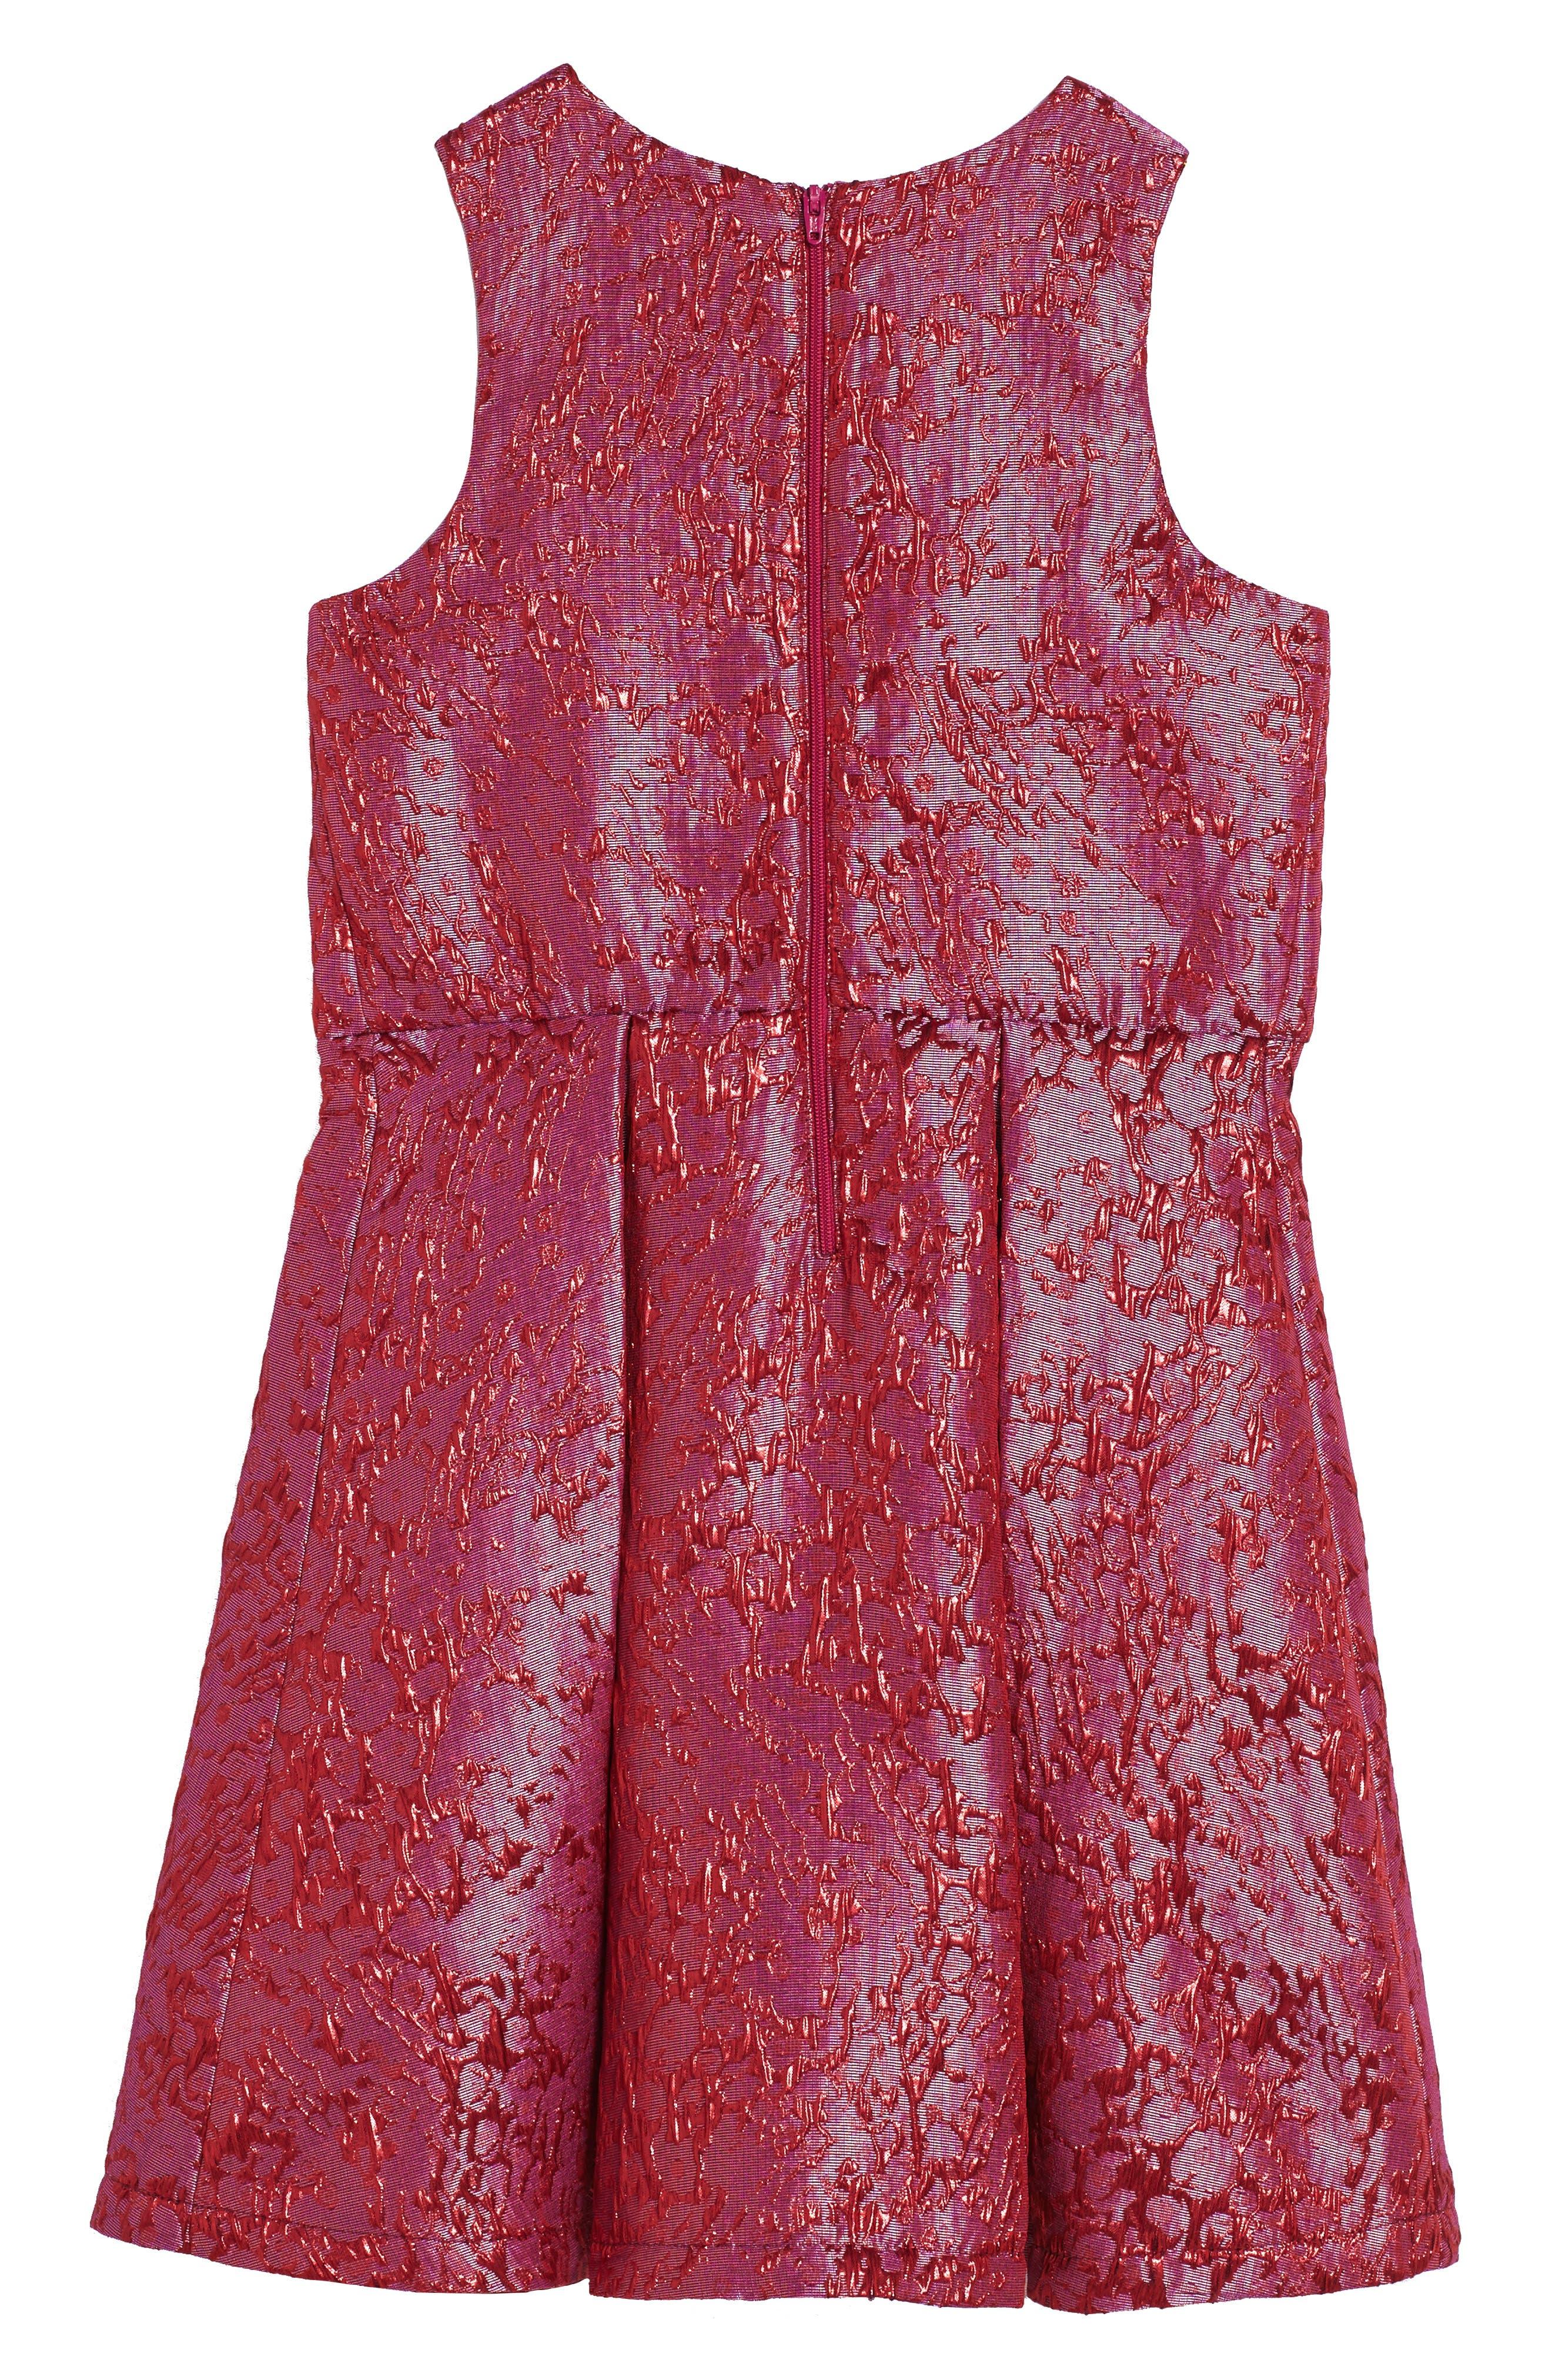 Textured Jacquard Dress,                             Alternate thumbnail 2, color,                             Pink Virtue Crackle